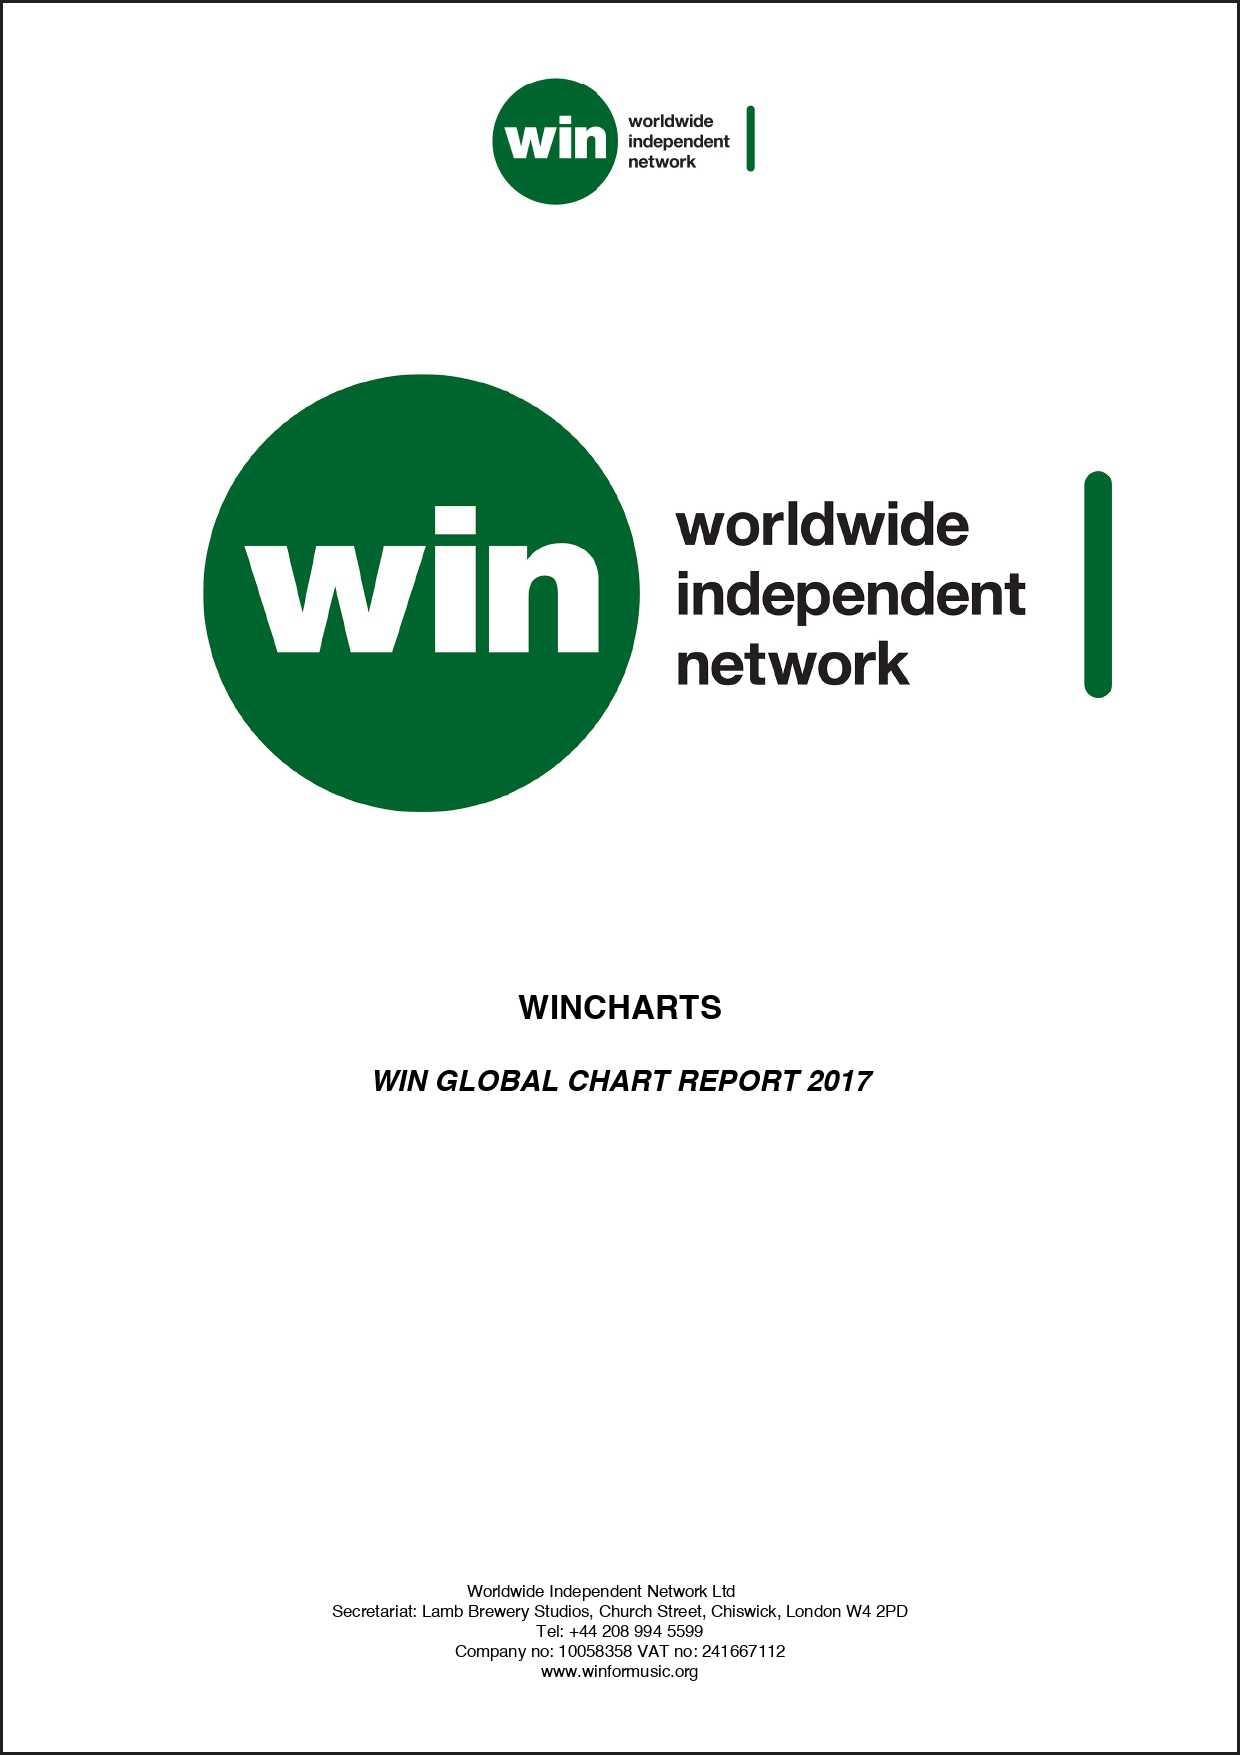 WINCHARTS - WIN Global Chart Report 2017